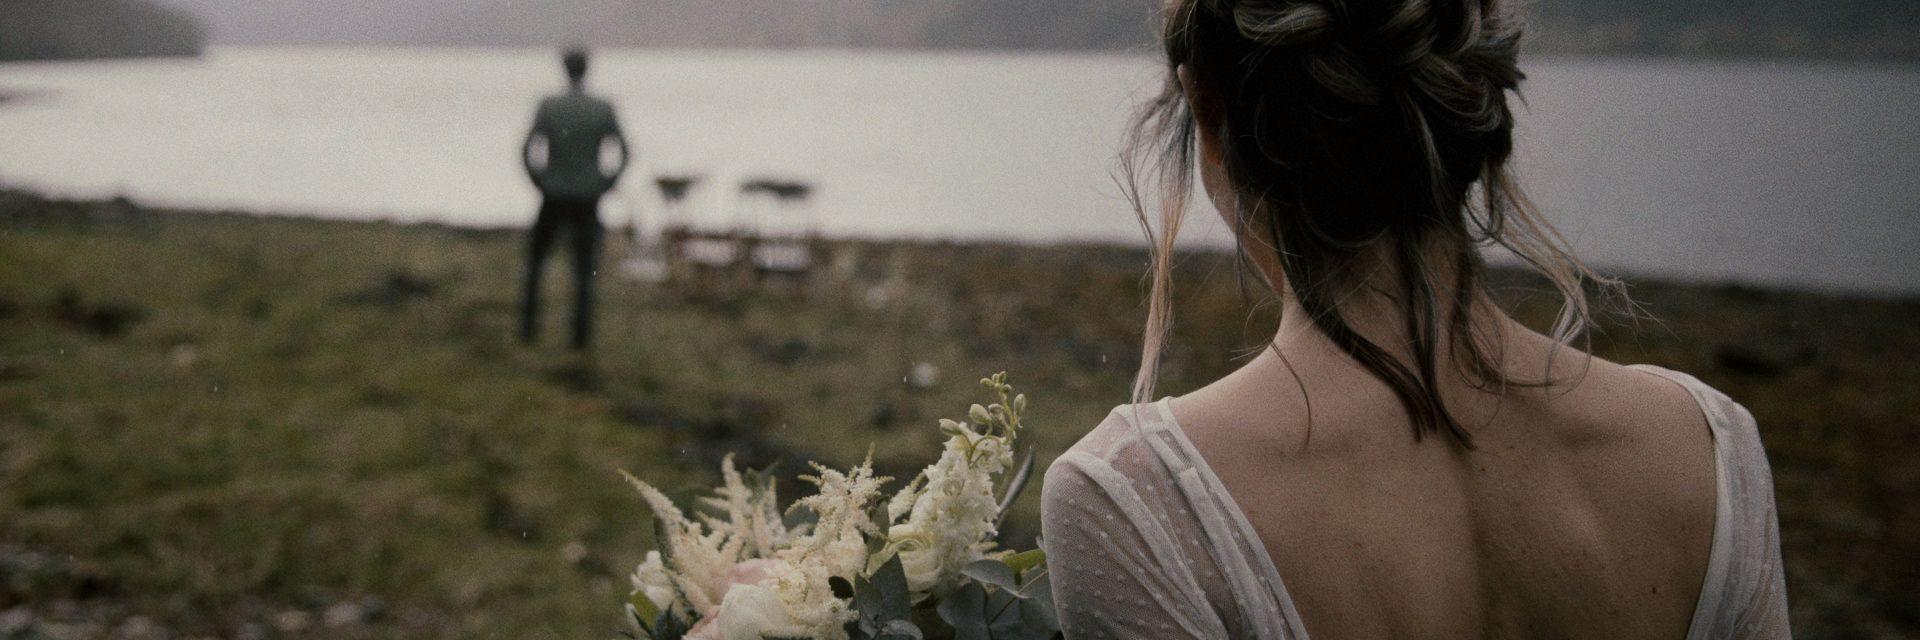 Firenze-wedding-videographer-cinemate-films-02